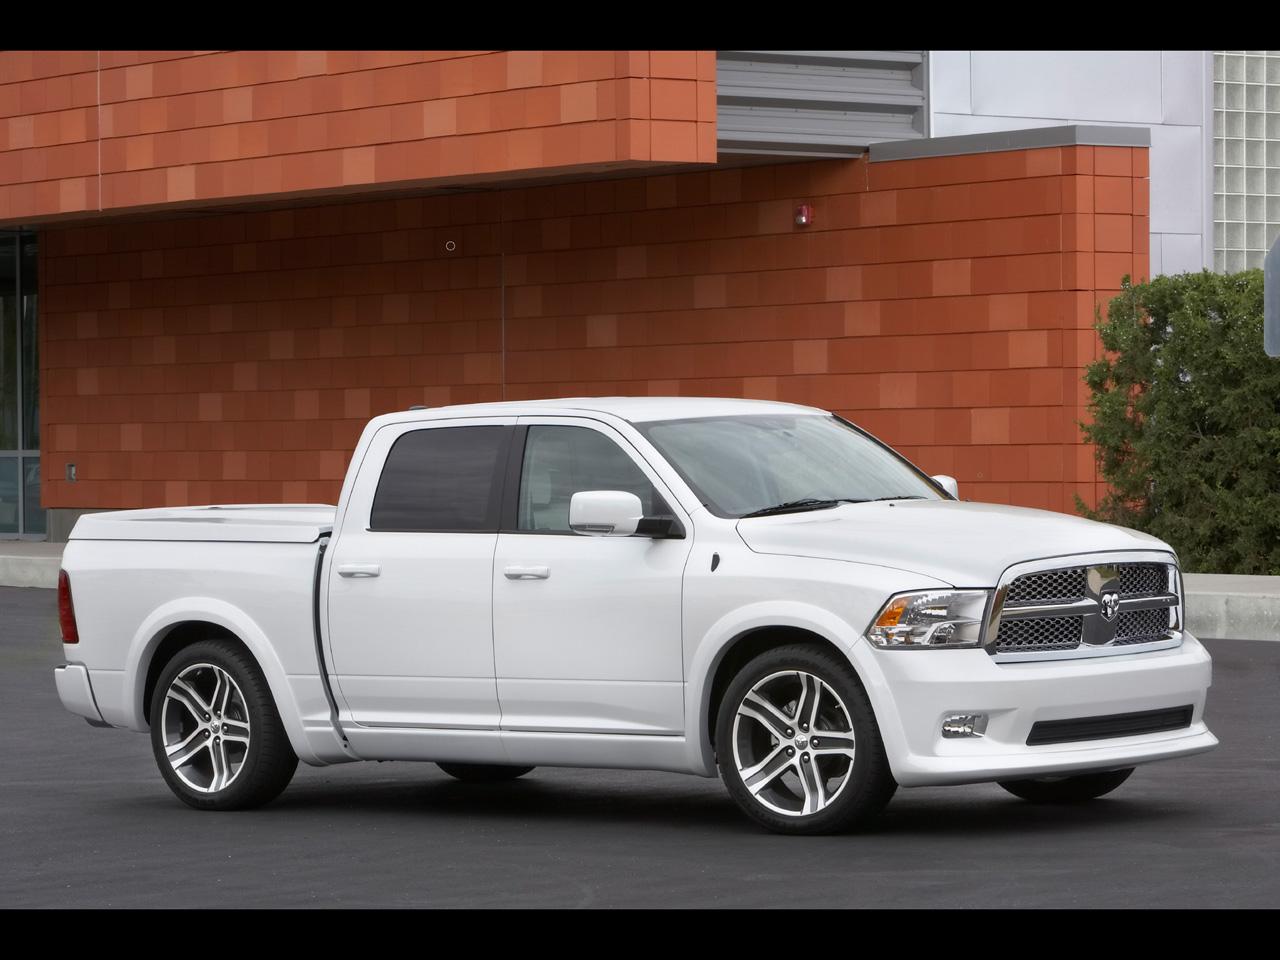 2009 Dodge Ram Bianco | Autos Post